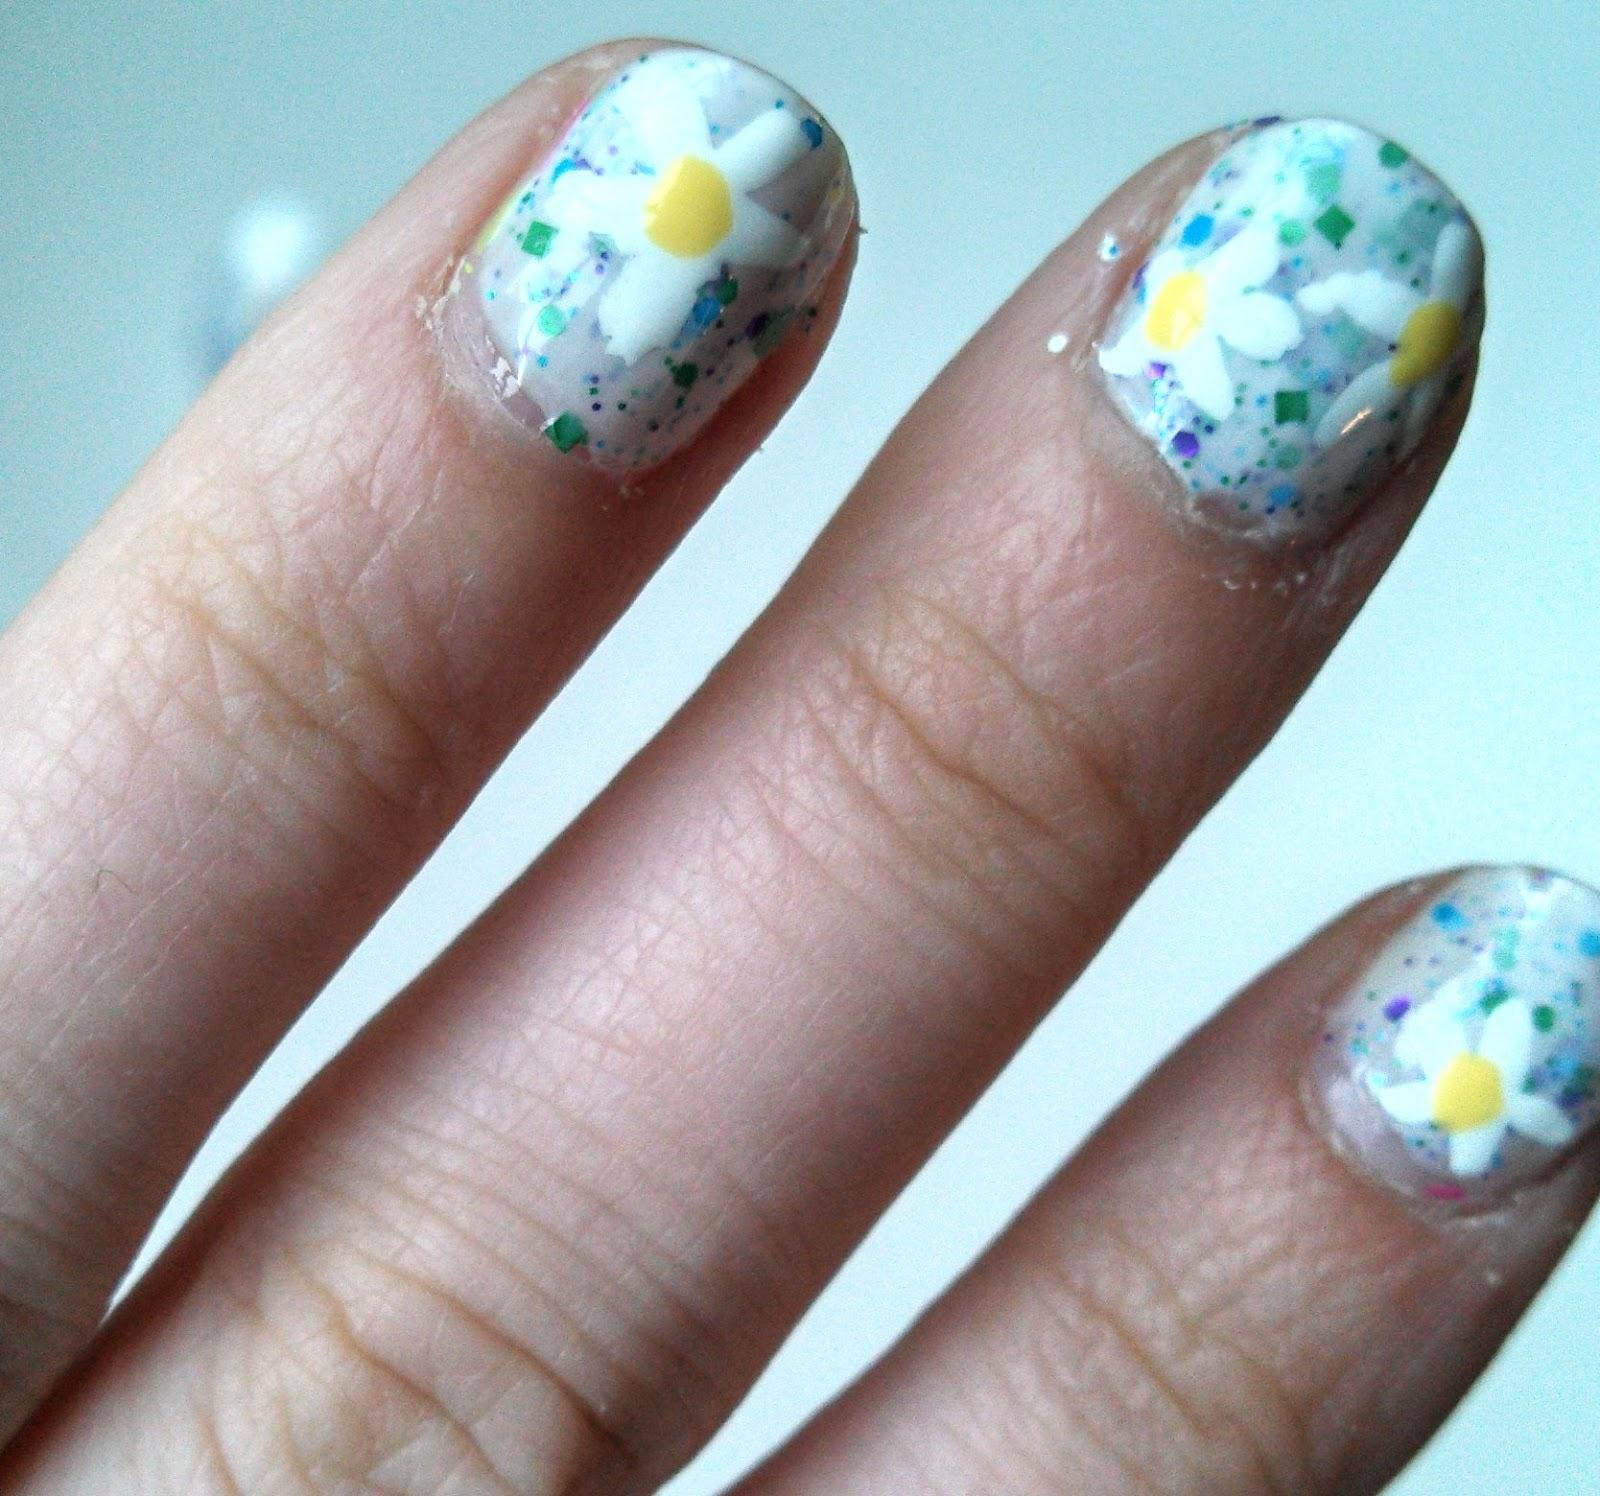 Playful Polishes June Nail Art Challenge Ocean Nails: Nail Polish? Nail Polish!: June Nail Art Challenge